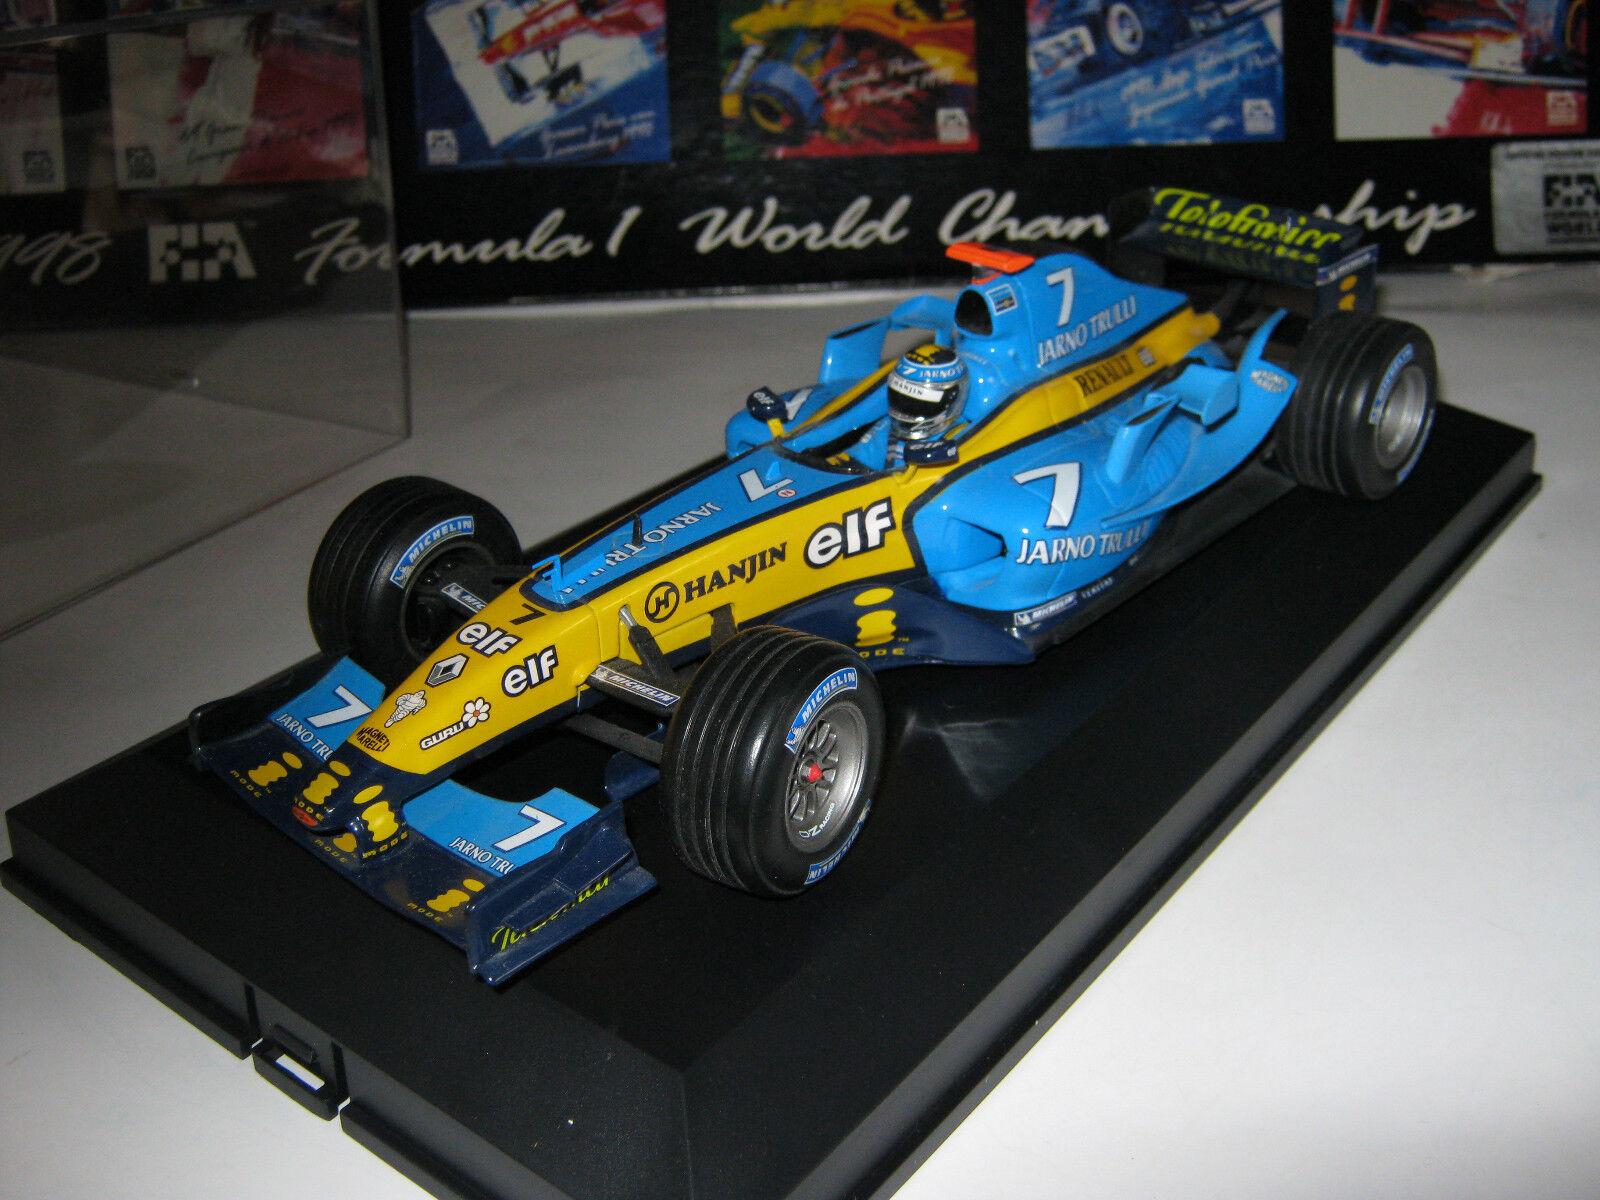 1 18 renault f1 r24 J. Trulli 2004 hotwheels f1 Top Dans Brandnew Showcase